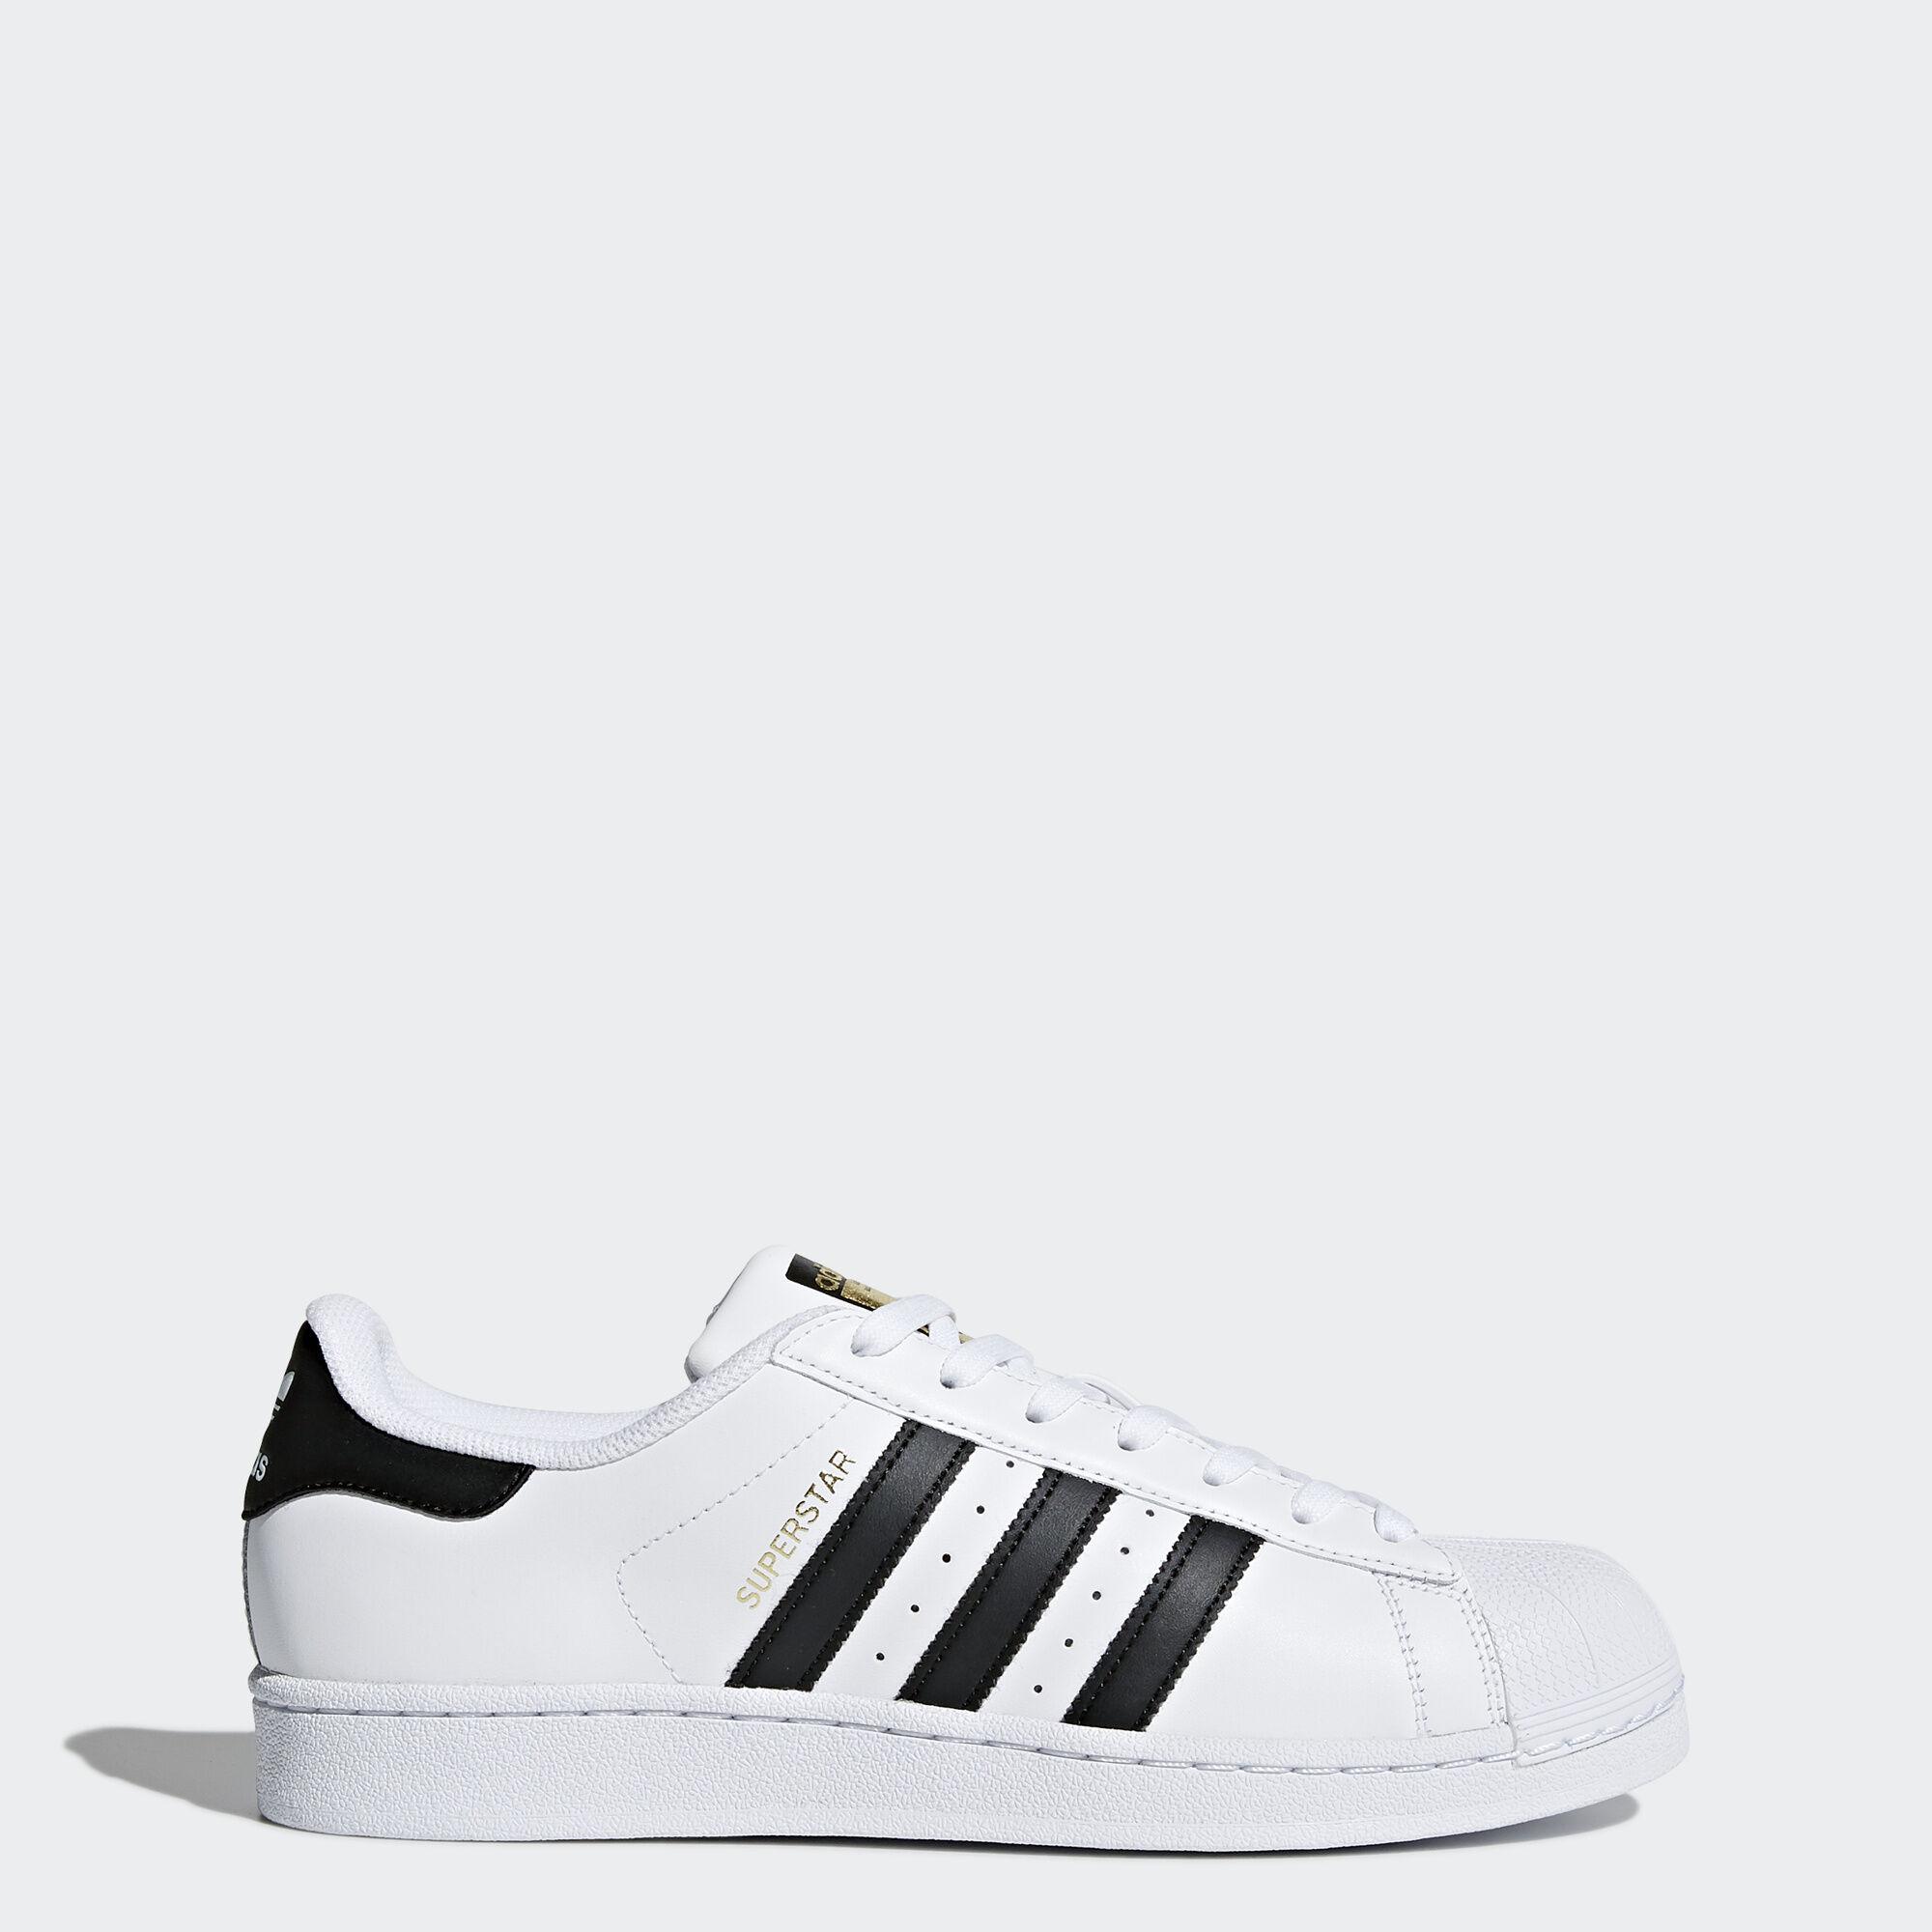 HjemmesideDanmark Officiel Adidas Adidas HjemmesideDanmark HjemmesideDanmark Adidas Adidas Officiel Adidas Officiel Officiel Adidas Officiel HjemmesideDanmark HjemmesideDanmark sdxrtBhQCo